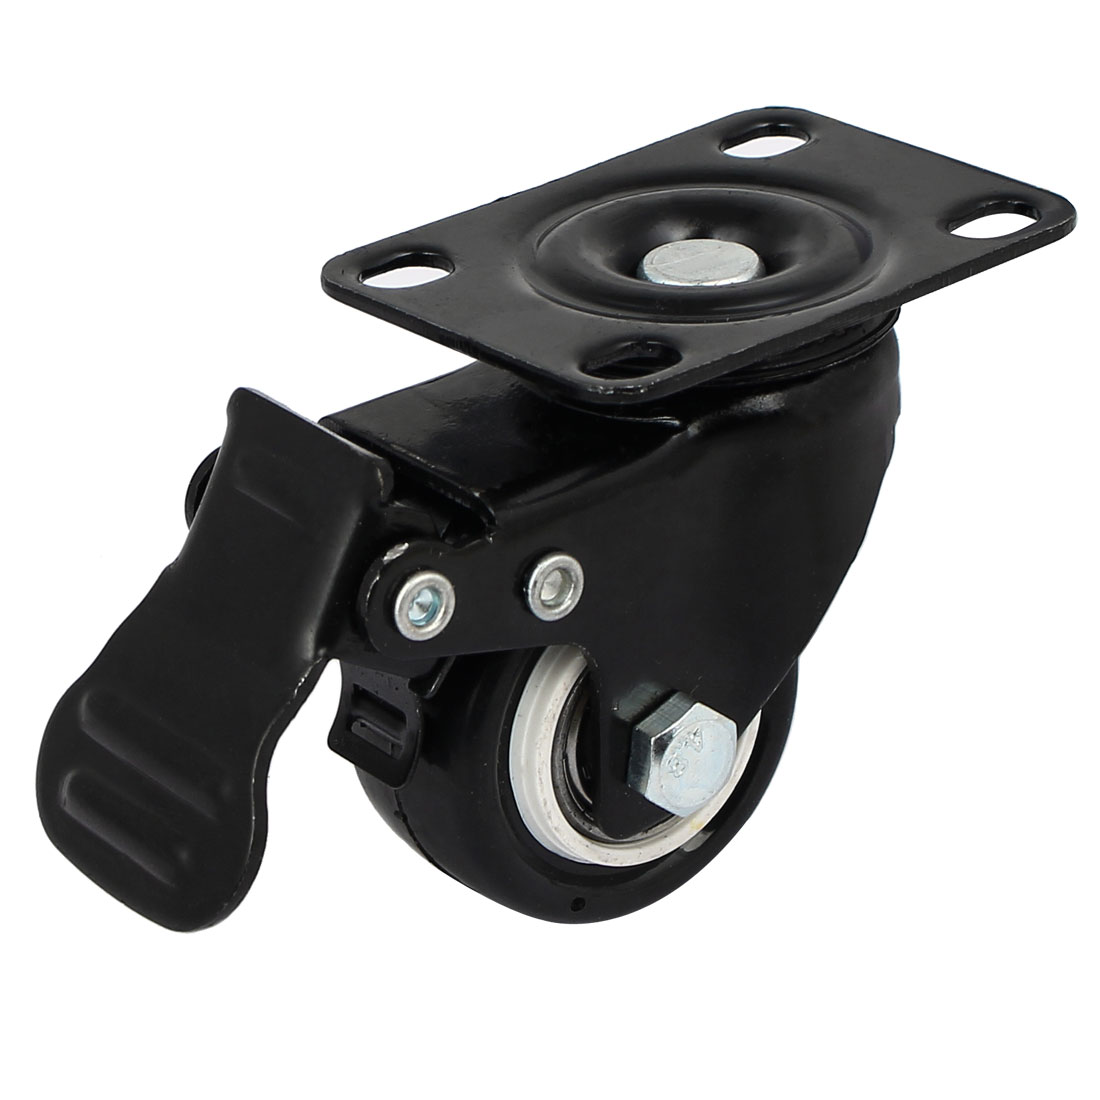 1.5'' Diameter Wheel Rotary Top Flat Plate Swivel Brake Caster Black